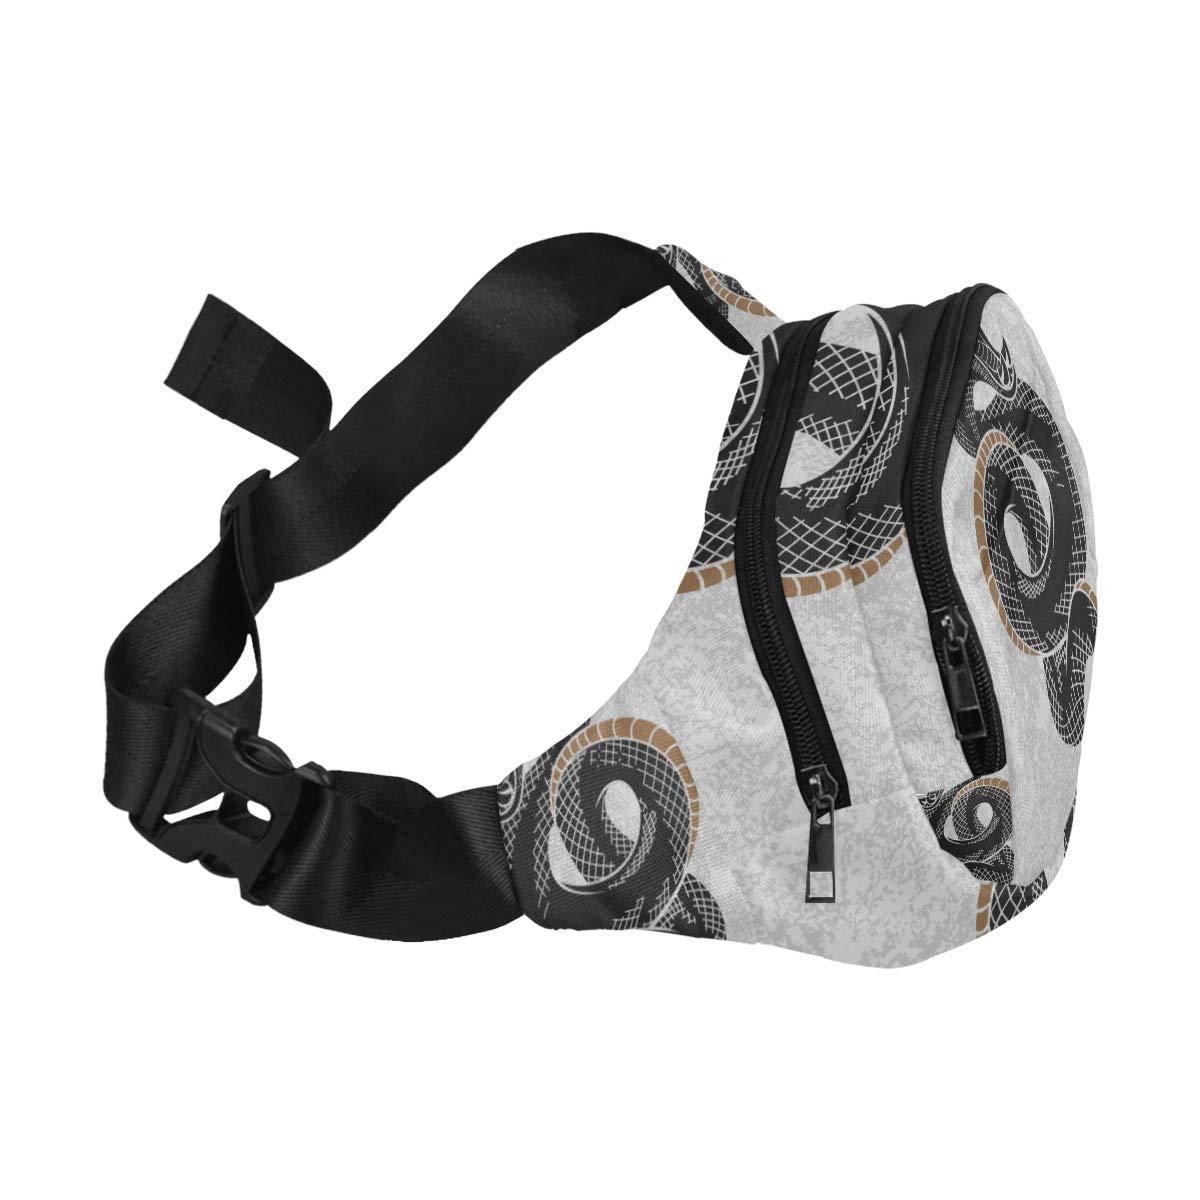 A Fierce Cold-blooded Snake Fenny Packs Waist Bags Adjustable Belt Waterproof Nylon Travel Running Sport Vacation Party For Men Women Boys Girls Kids